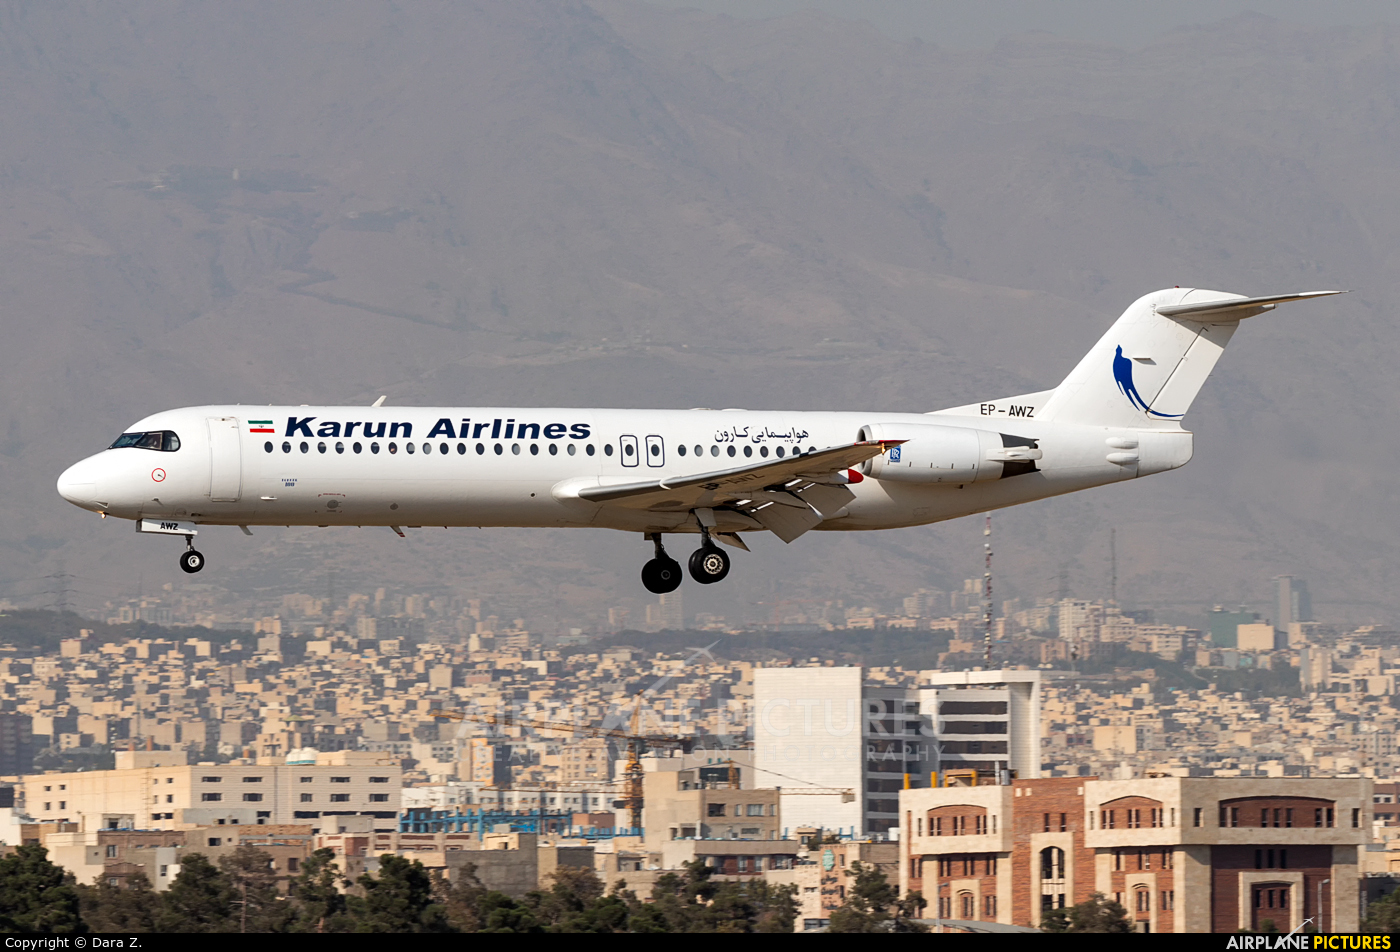 Naft Airlines EP-AWZ aircraft at Tehran - Mehrabad Intl